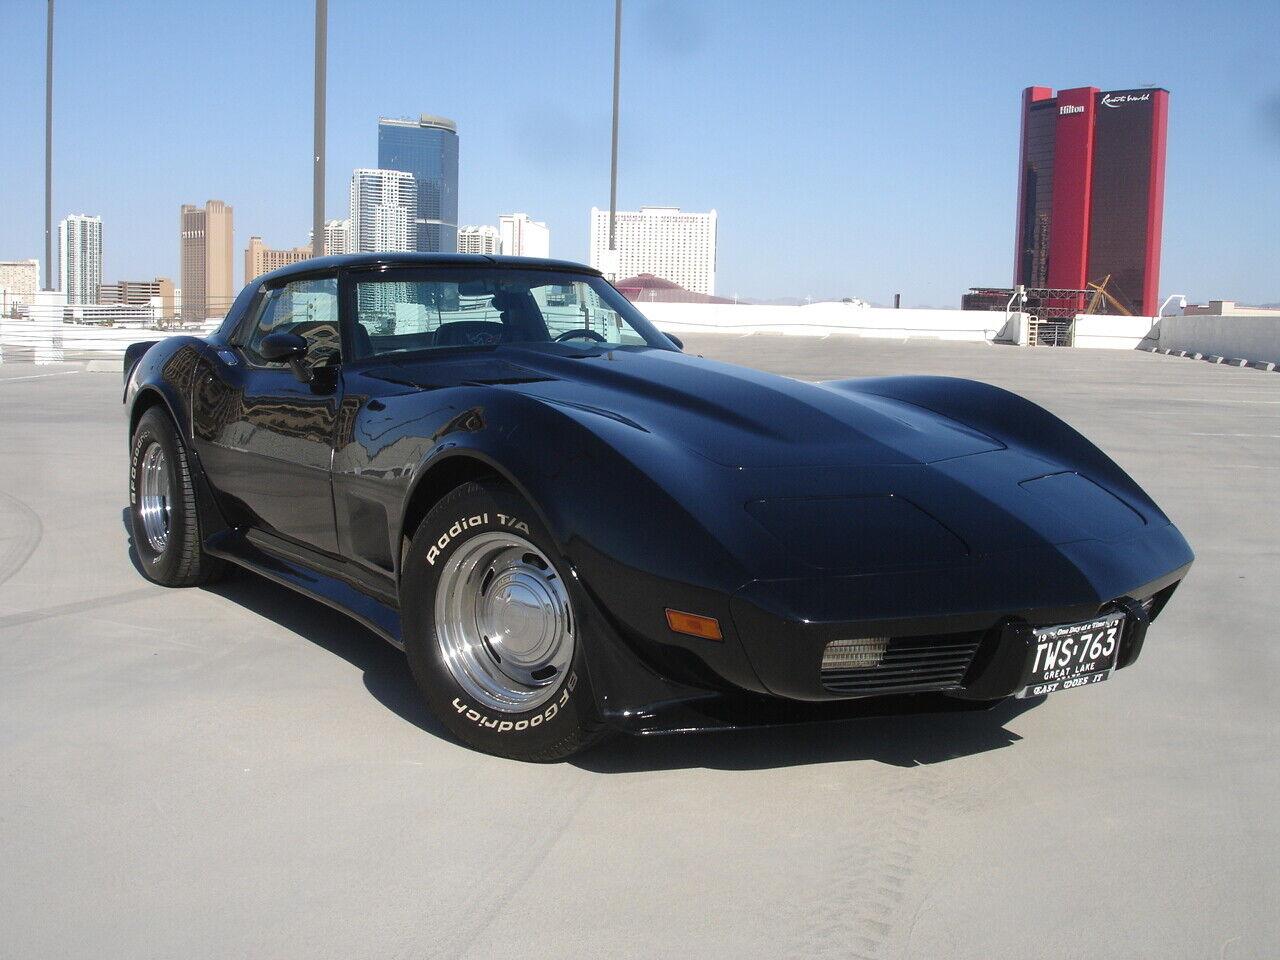 1979 corvette 30k orig miles.  C3 T-Top      Tastefully upgraded by adult owner